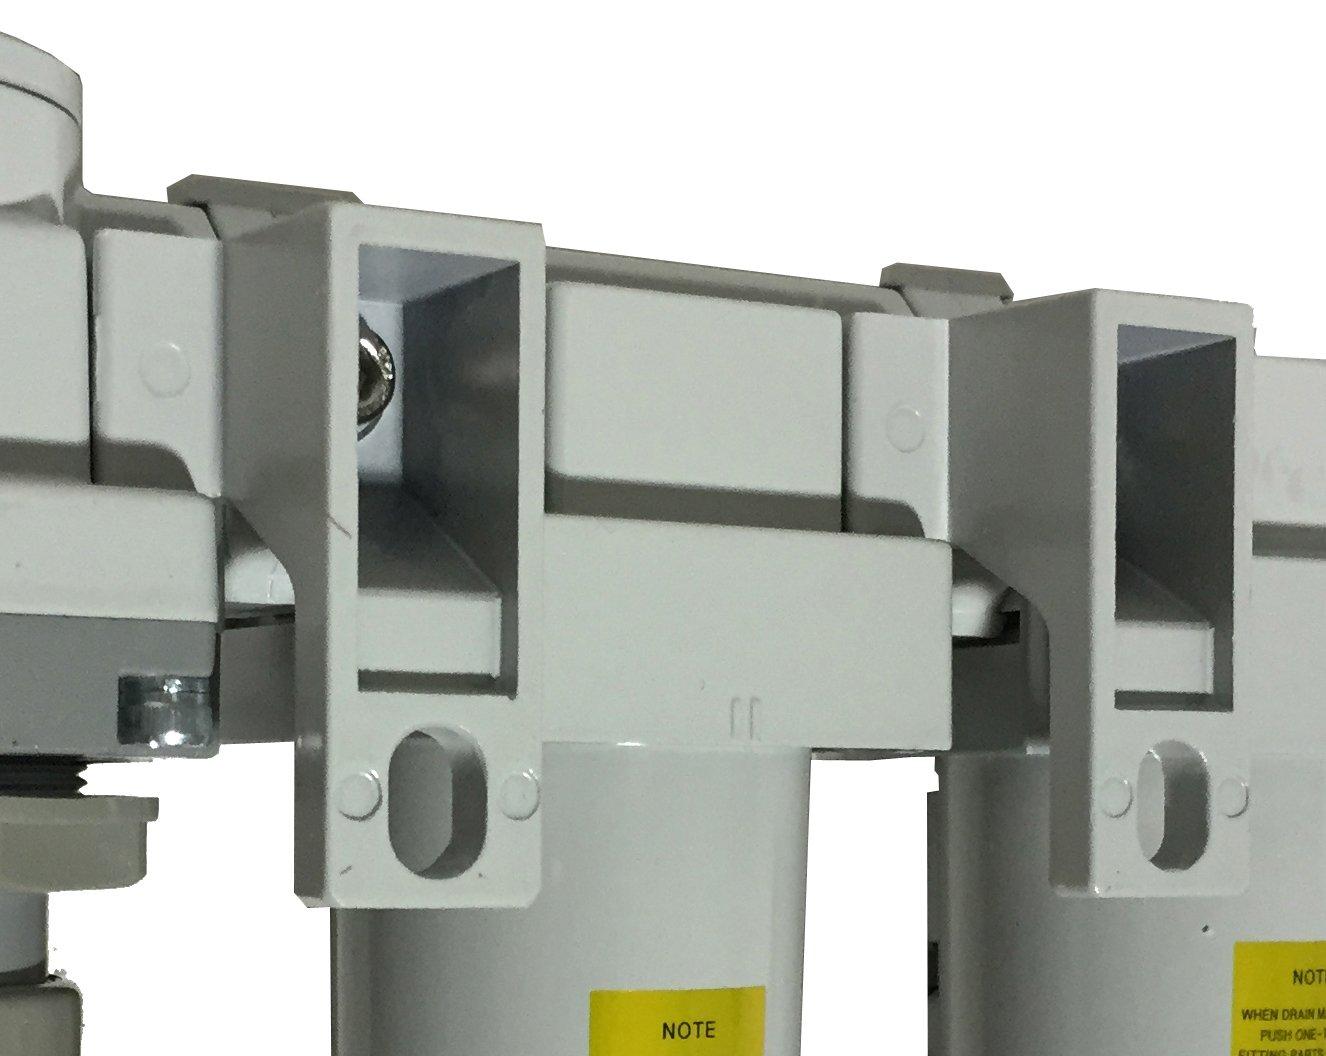 PneumaticPlus SAU4000M-N04G Three-Unit Combo Compressed Air Filter Regulator Lubricator FRL, Air Preparation Unit 1/2'' NPT - Manual Drain, Poly Bowl, 10 Micron with Gauge by PneumaticPlus